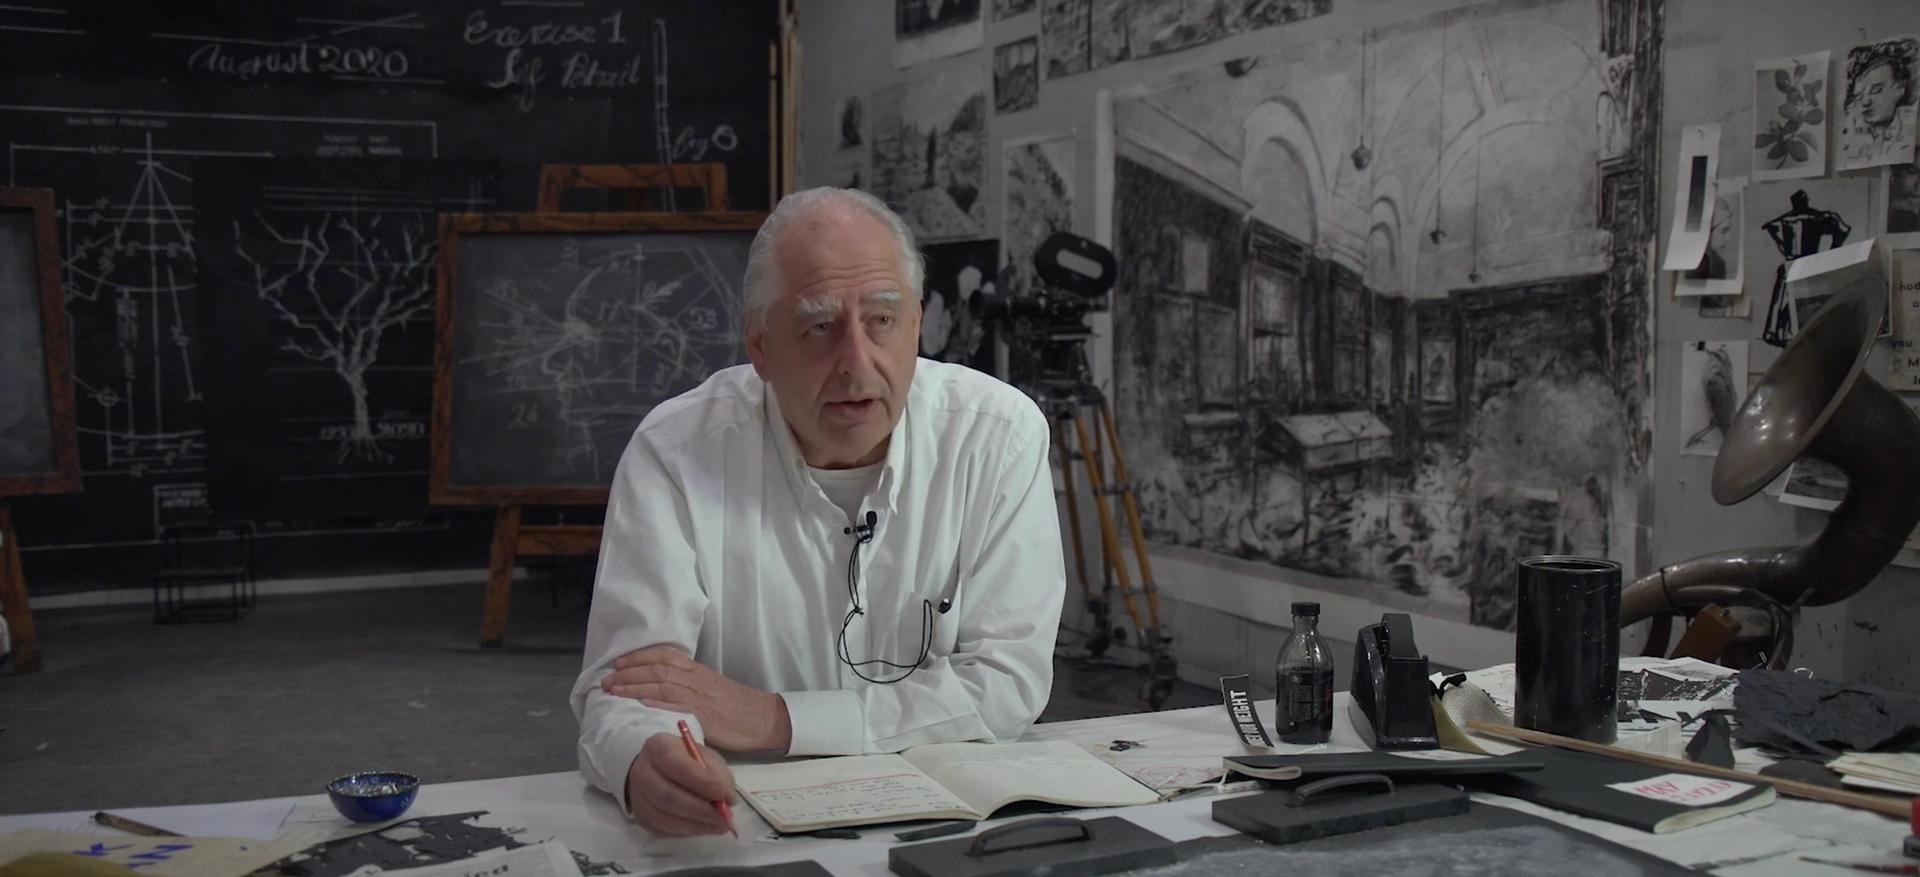 A still from William Kentridge's video explaining his new film City Deep (2020) Courtesy of Goodman Gallery